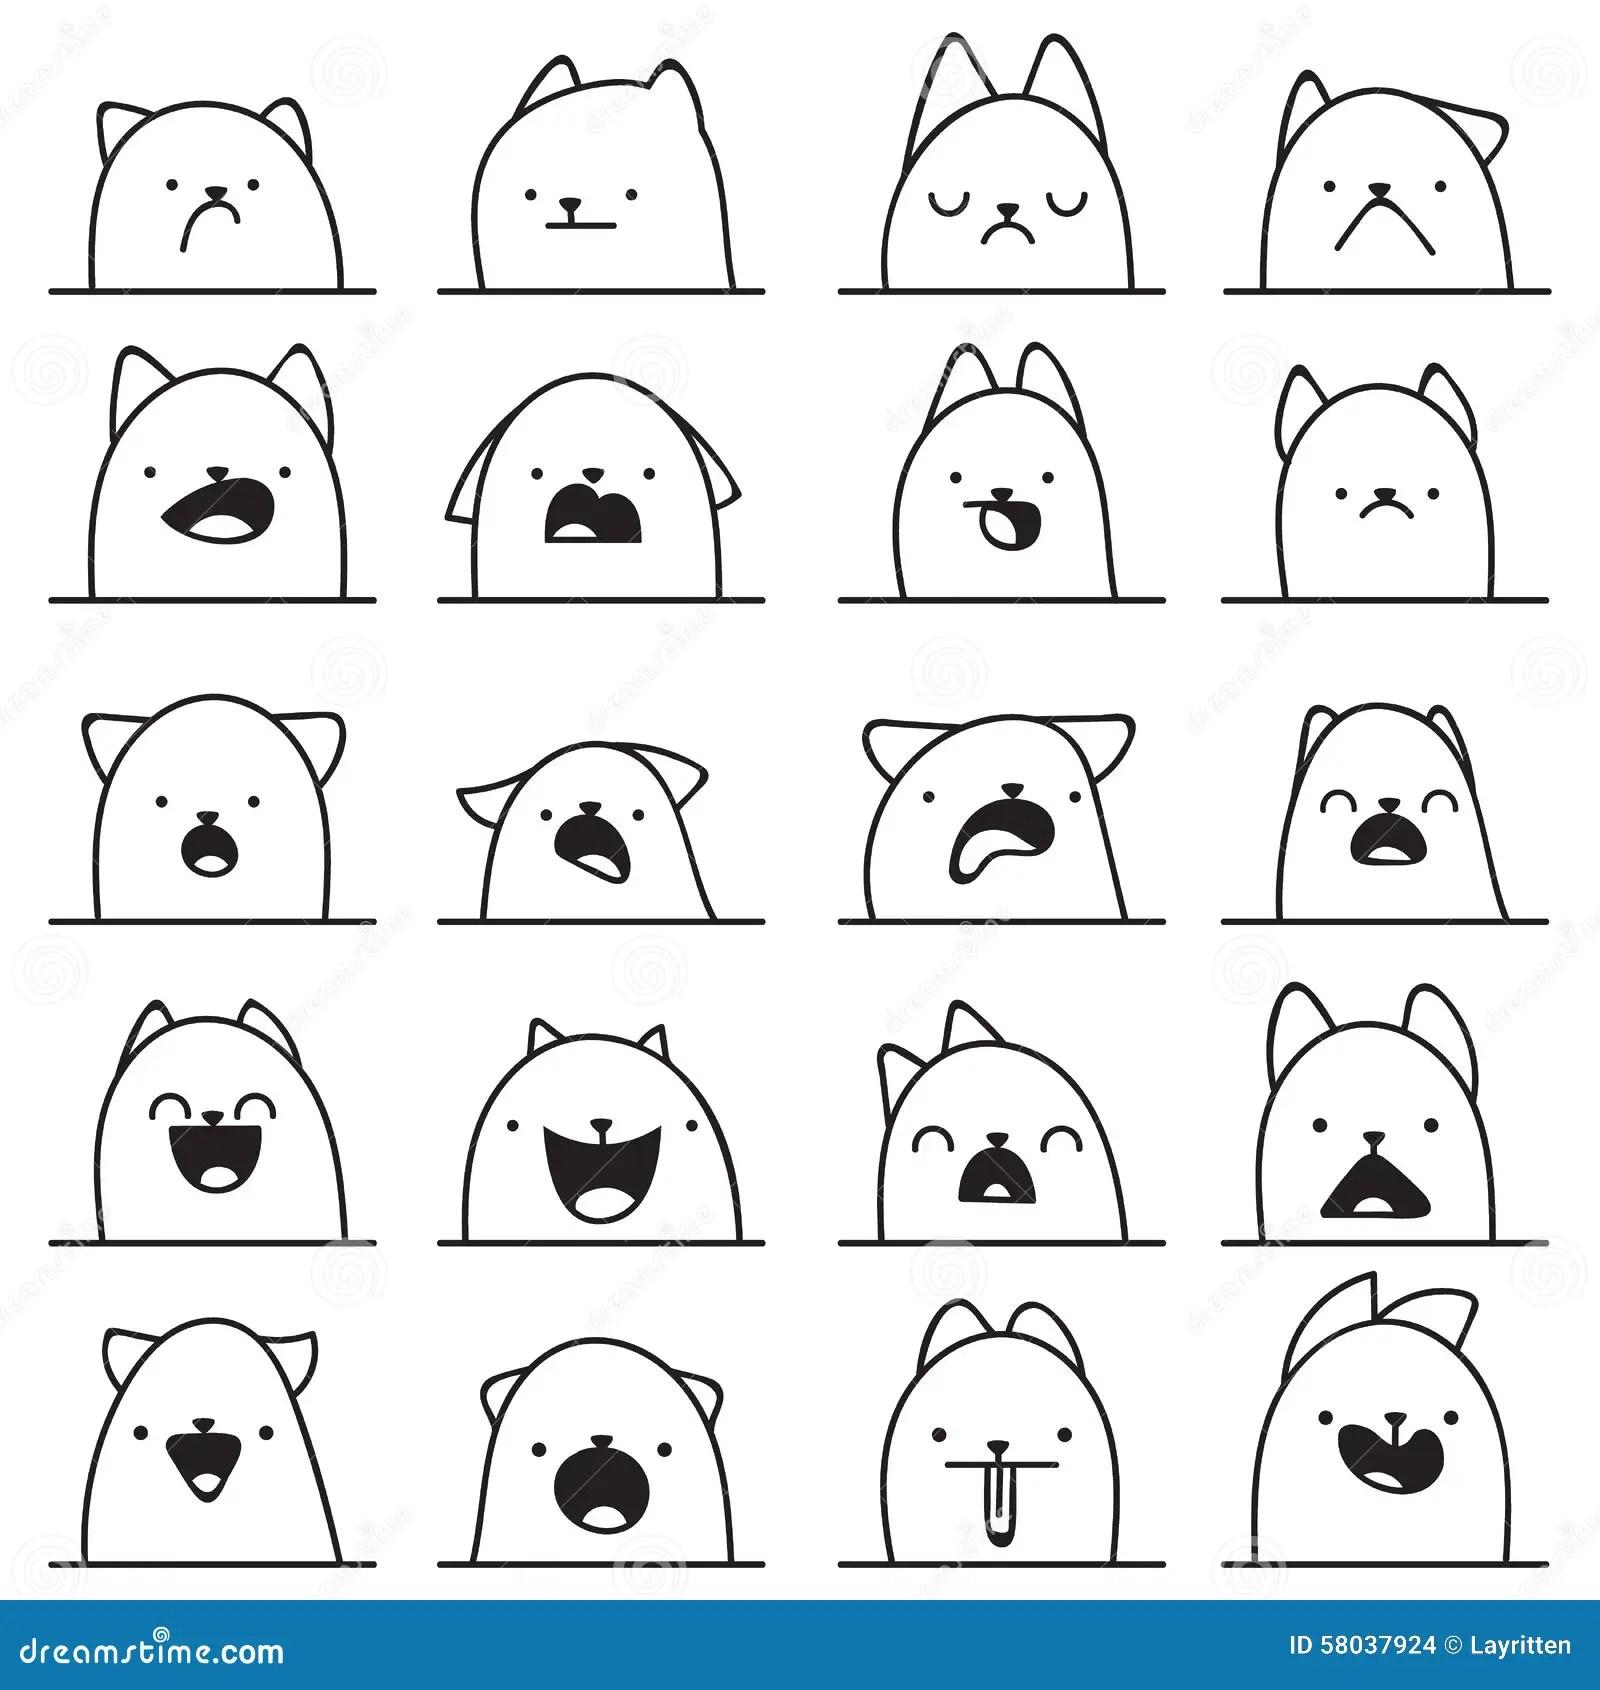 Set Of 20 Different Emotions Cat Anime Doodle Design